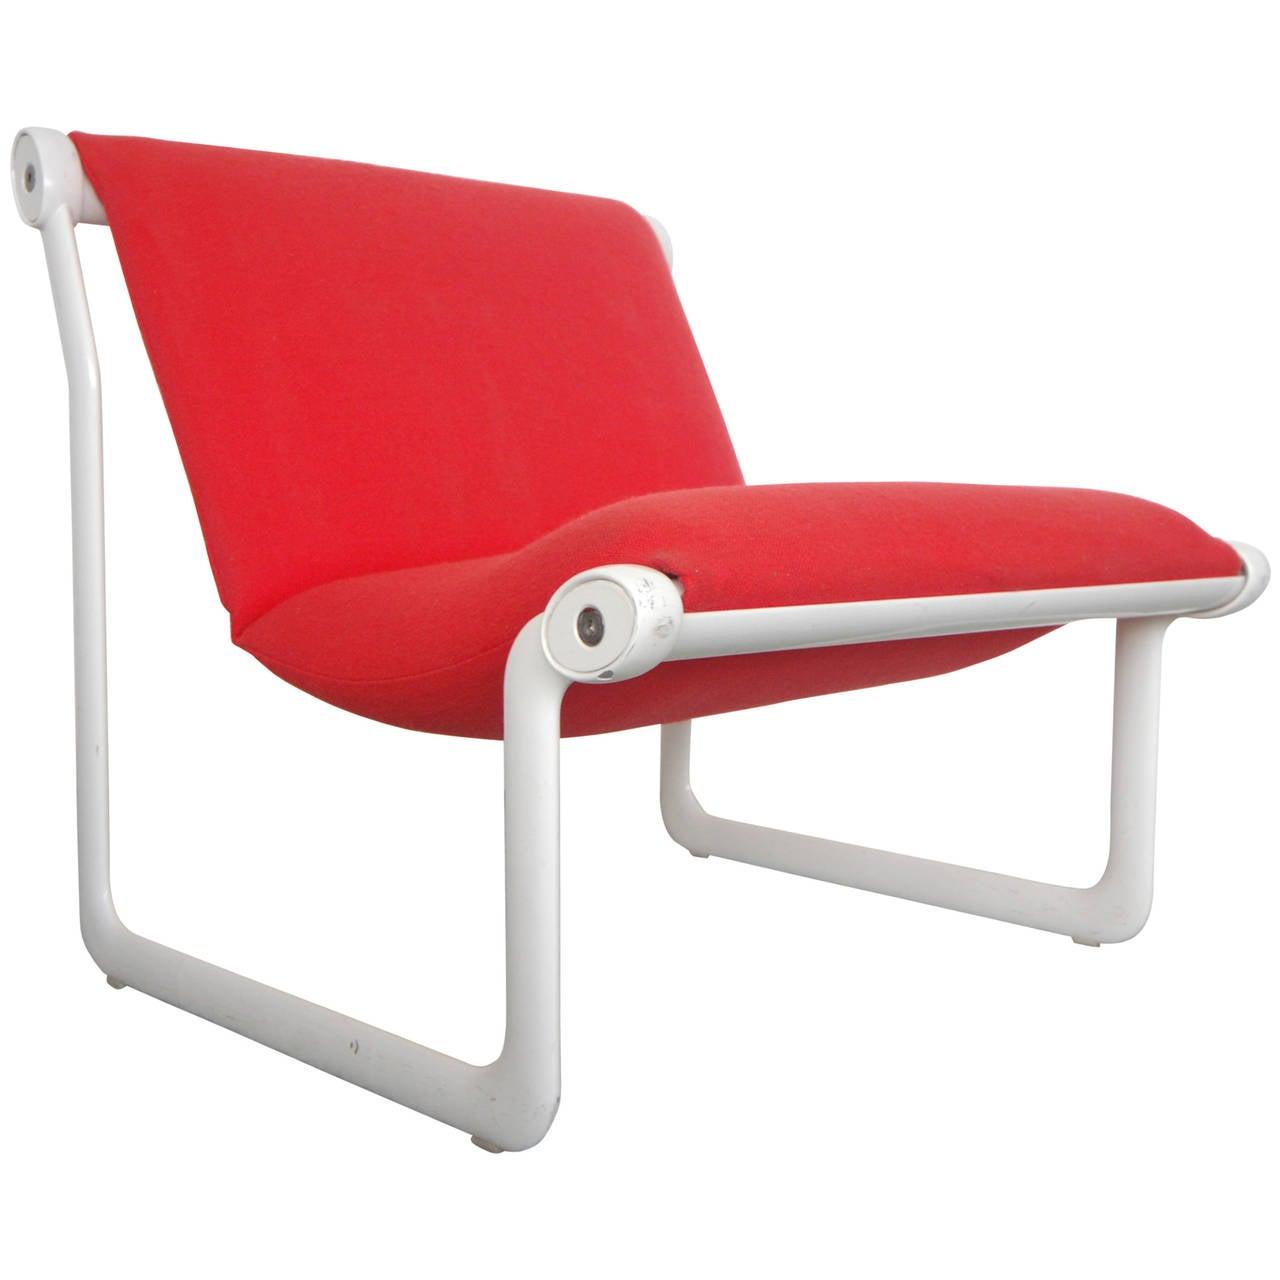 knoll hannah morrison sling lounge chair at stdibs - knoll hannah morrison sling lounge chair